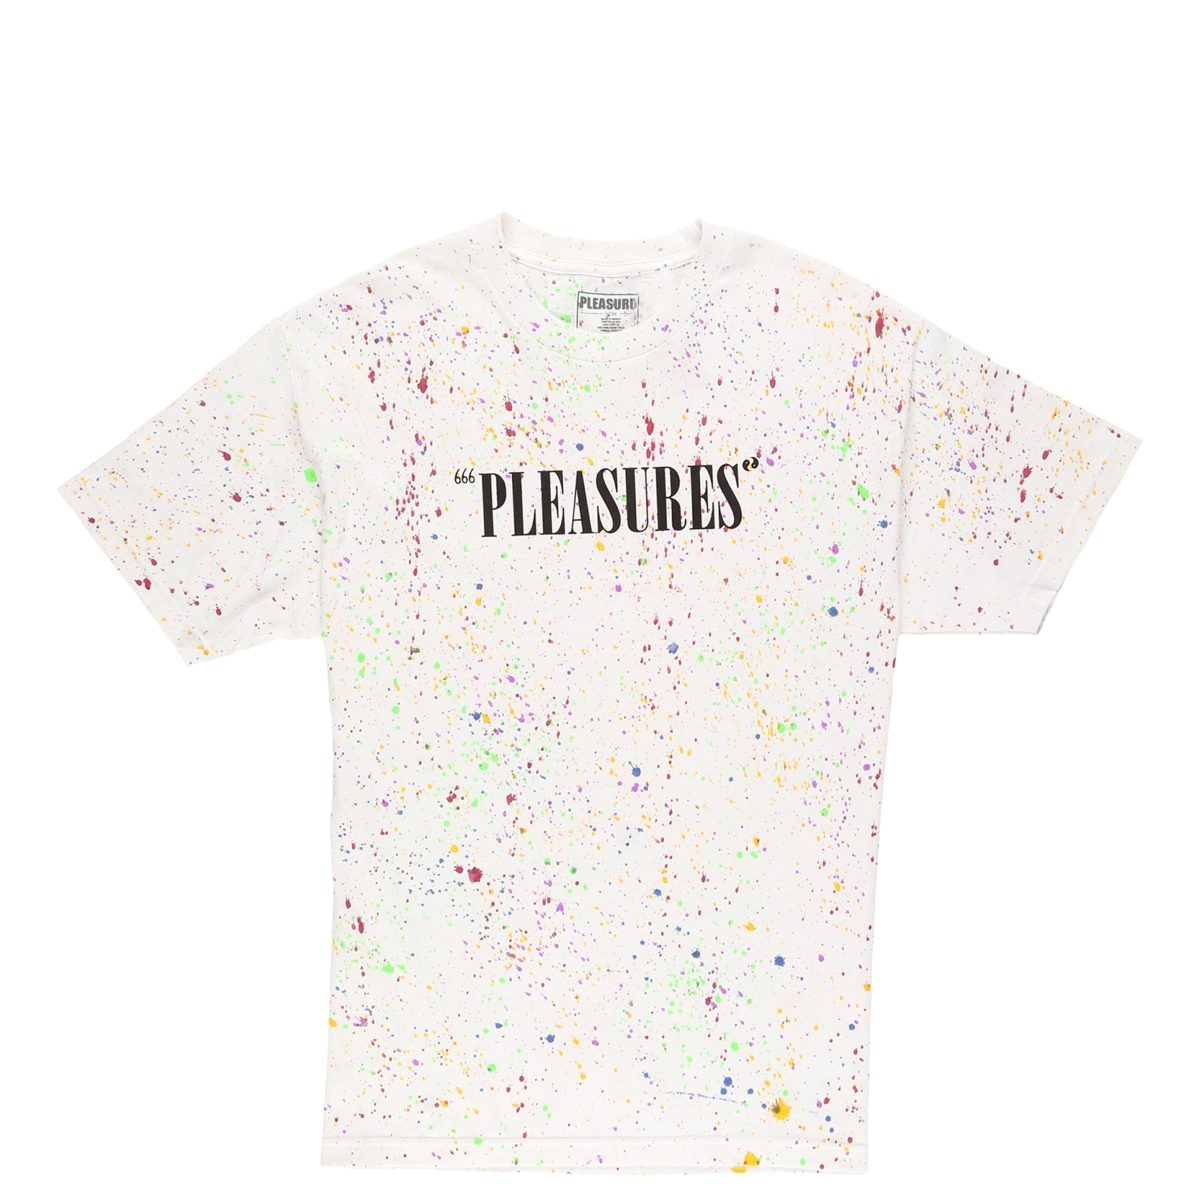 【PLEASURES/プレジャーズ】BALANCE TYE DYE T-SHIRT Tシャツ / SPECKLE WHITE